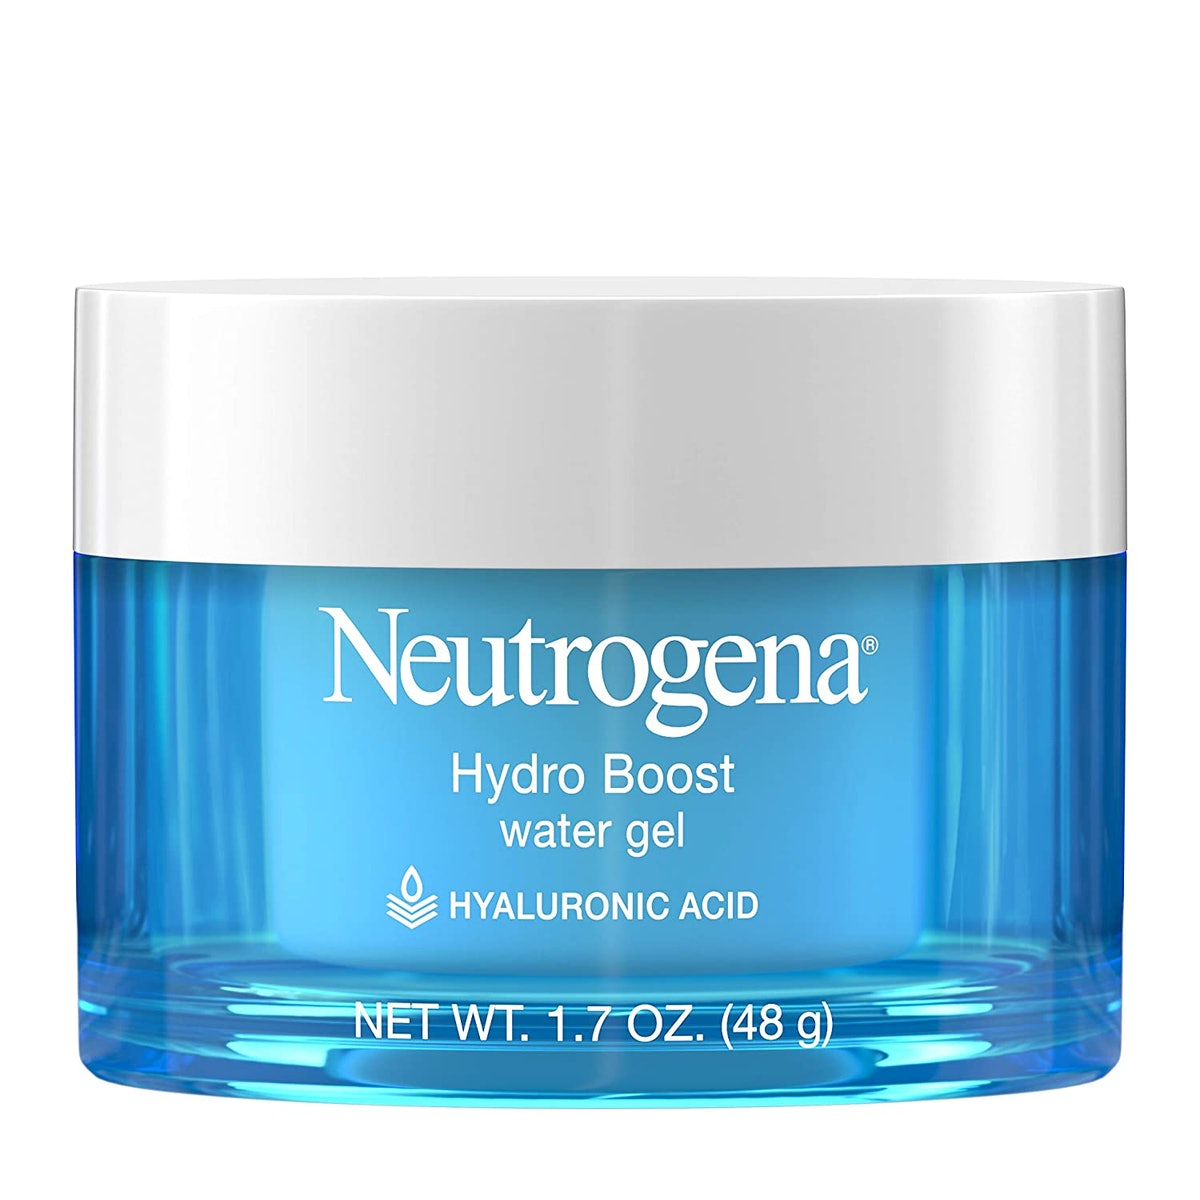 Neutrogena Hydro Boost Water Gel Daily Face Moisturizer